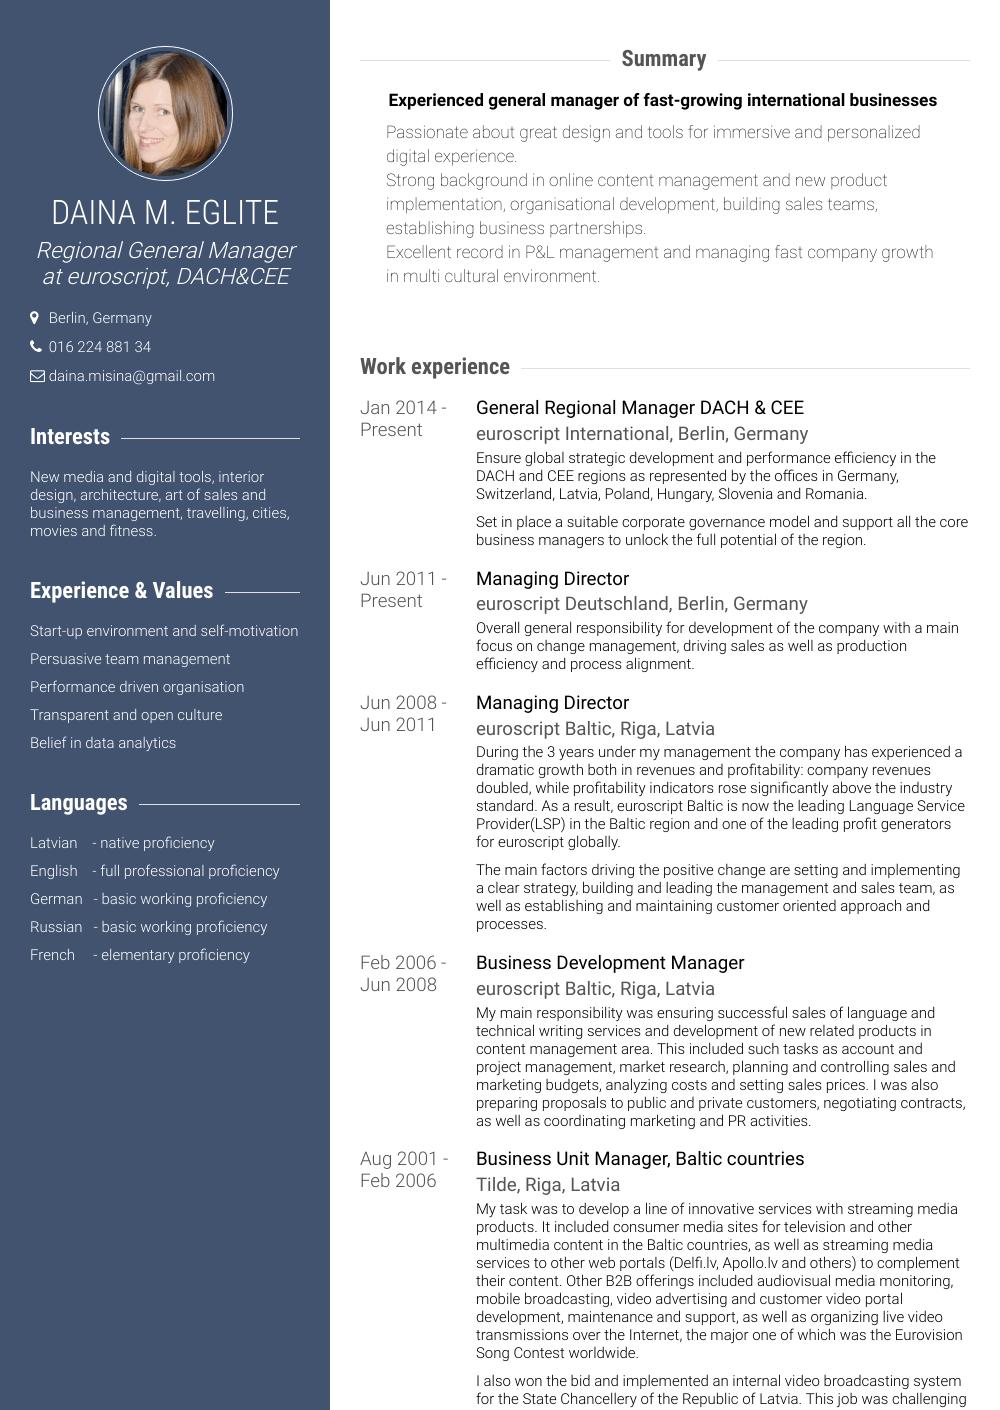 Regional Manager - Resume Samples & Templates | VisualCV